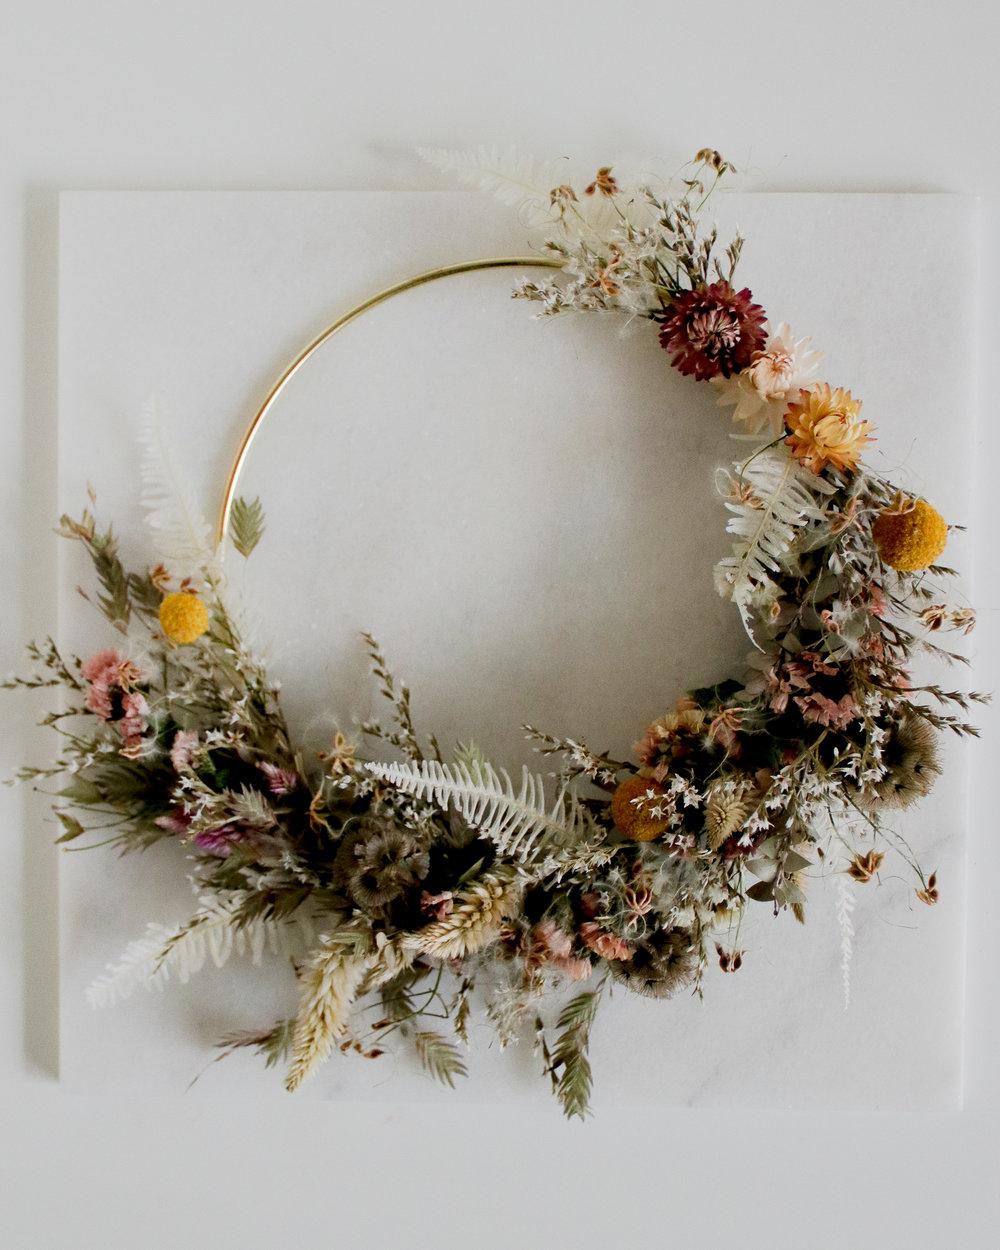 Dried Flower Wreath Willa Rose Floral - $60